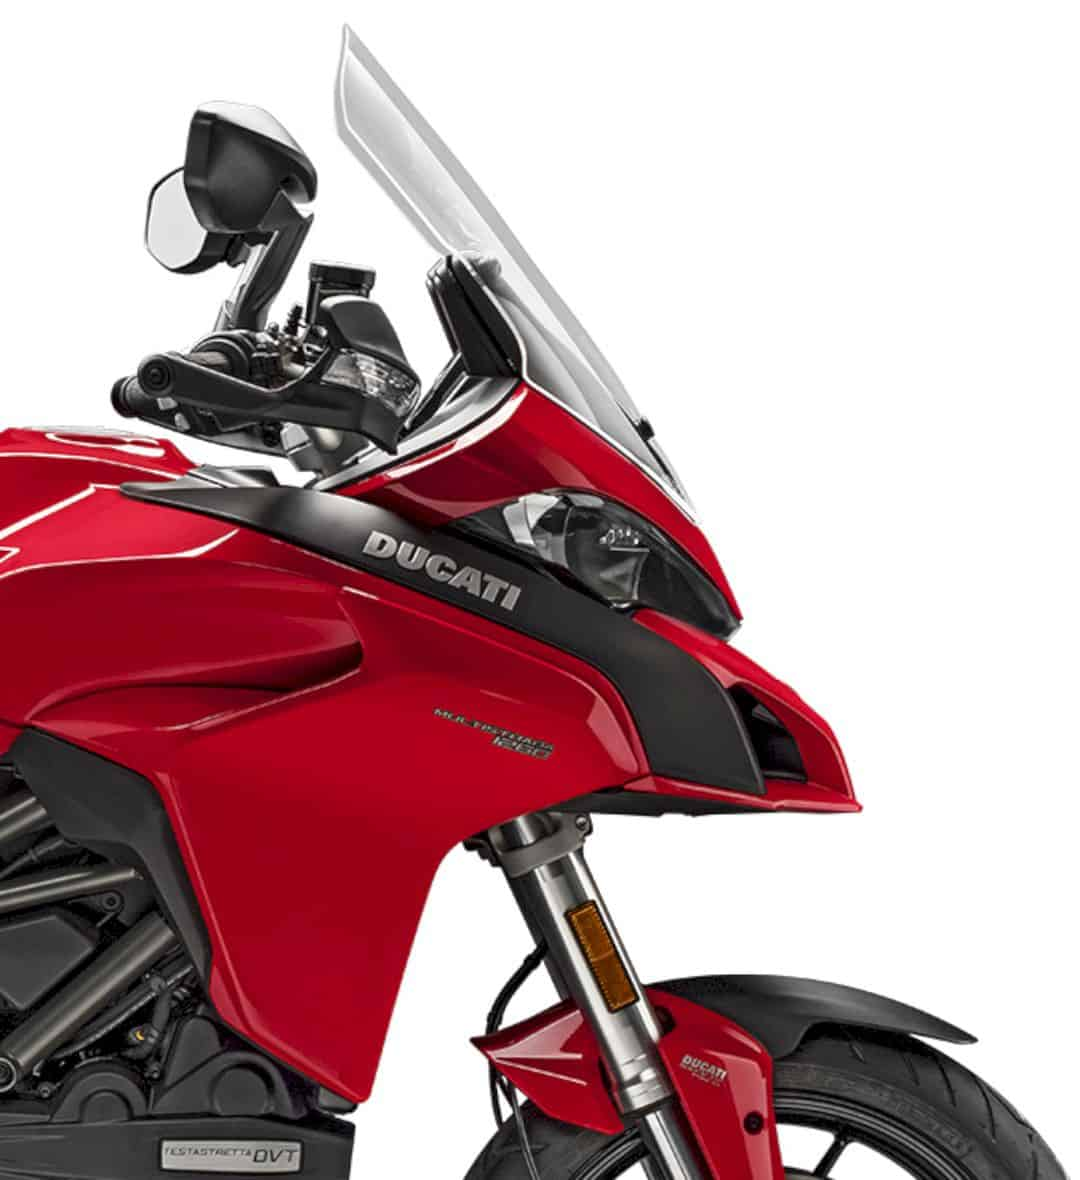 The New Multistrada 1260 By Ducati 6